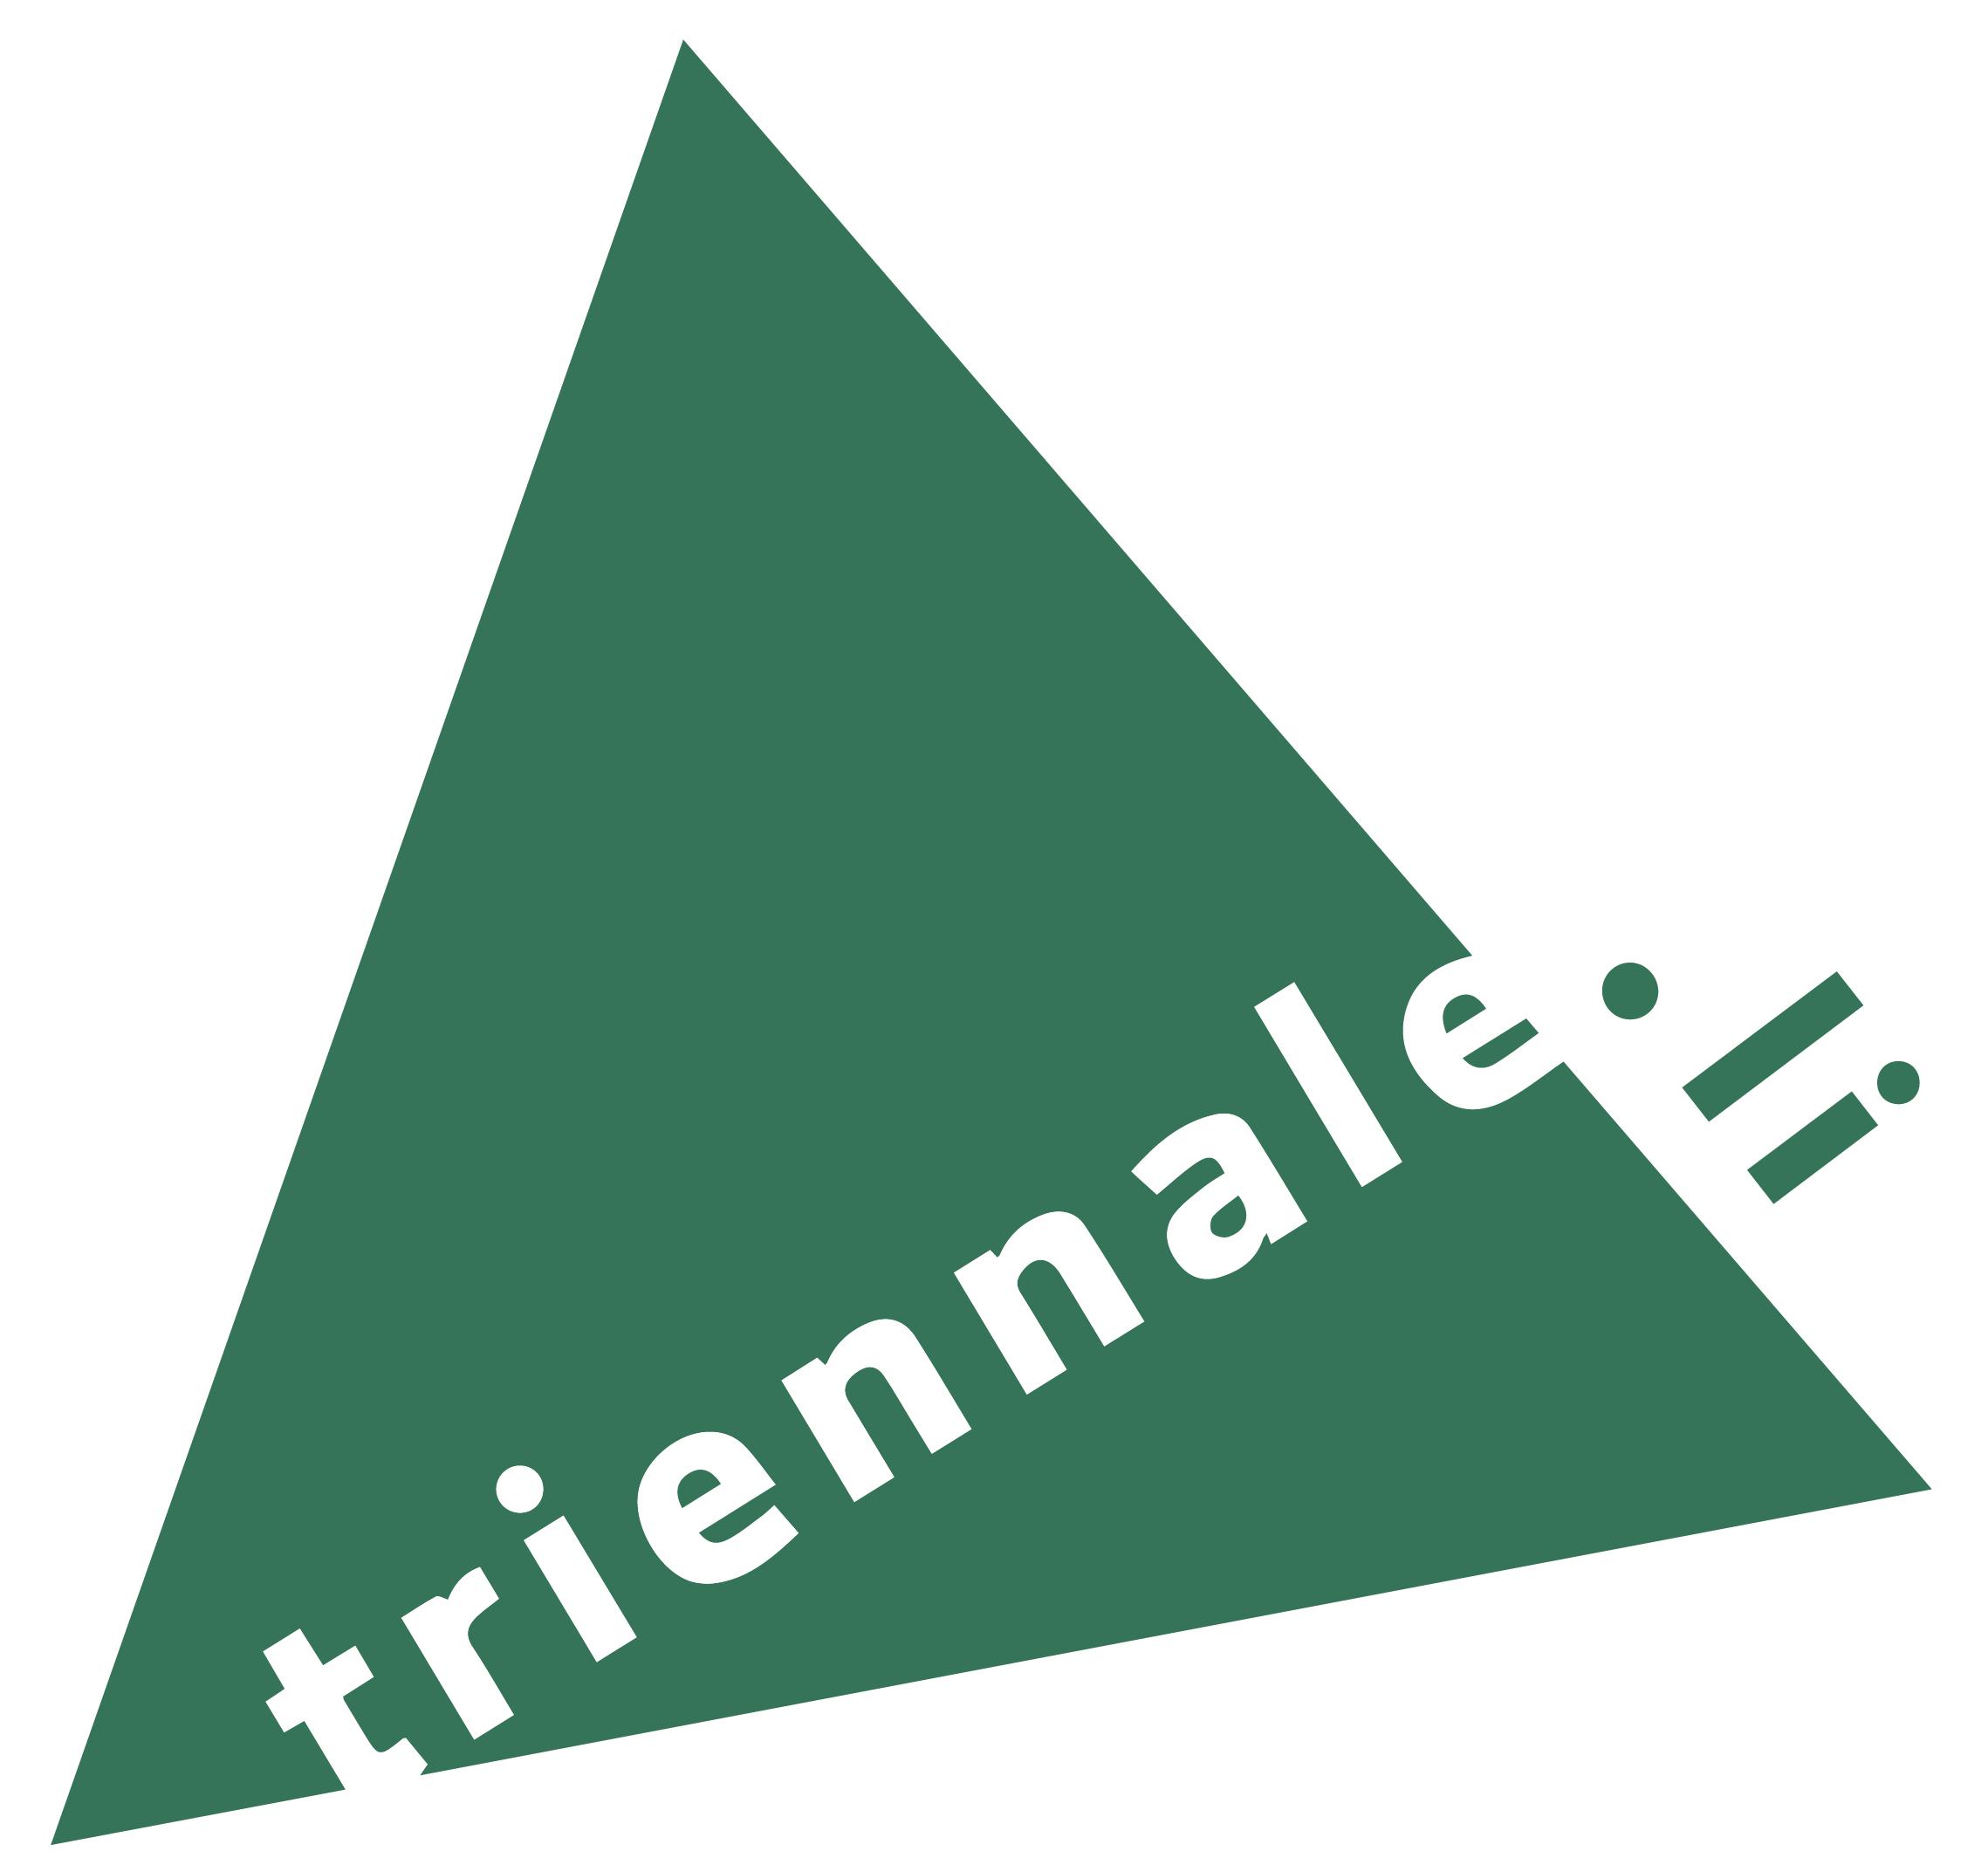 Triennale Logo grün_CMYK.jpg